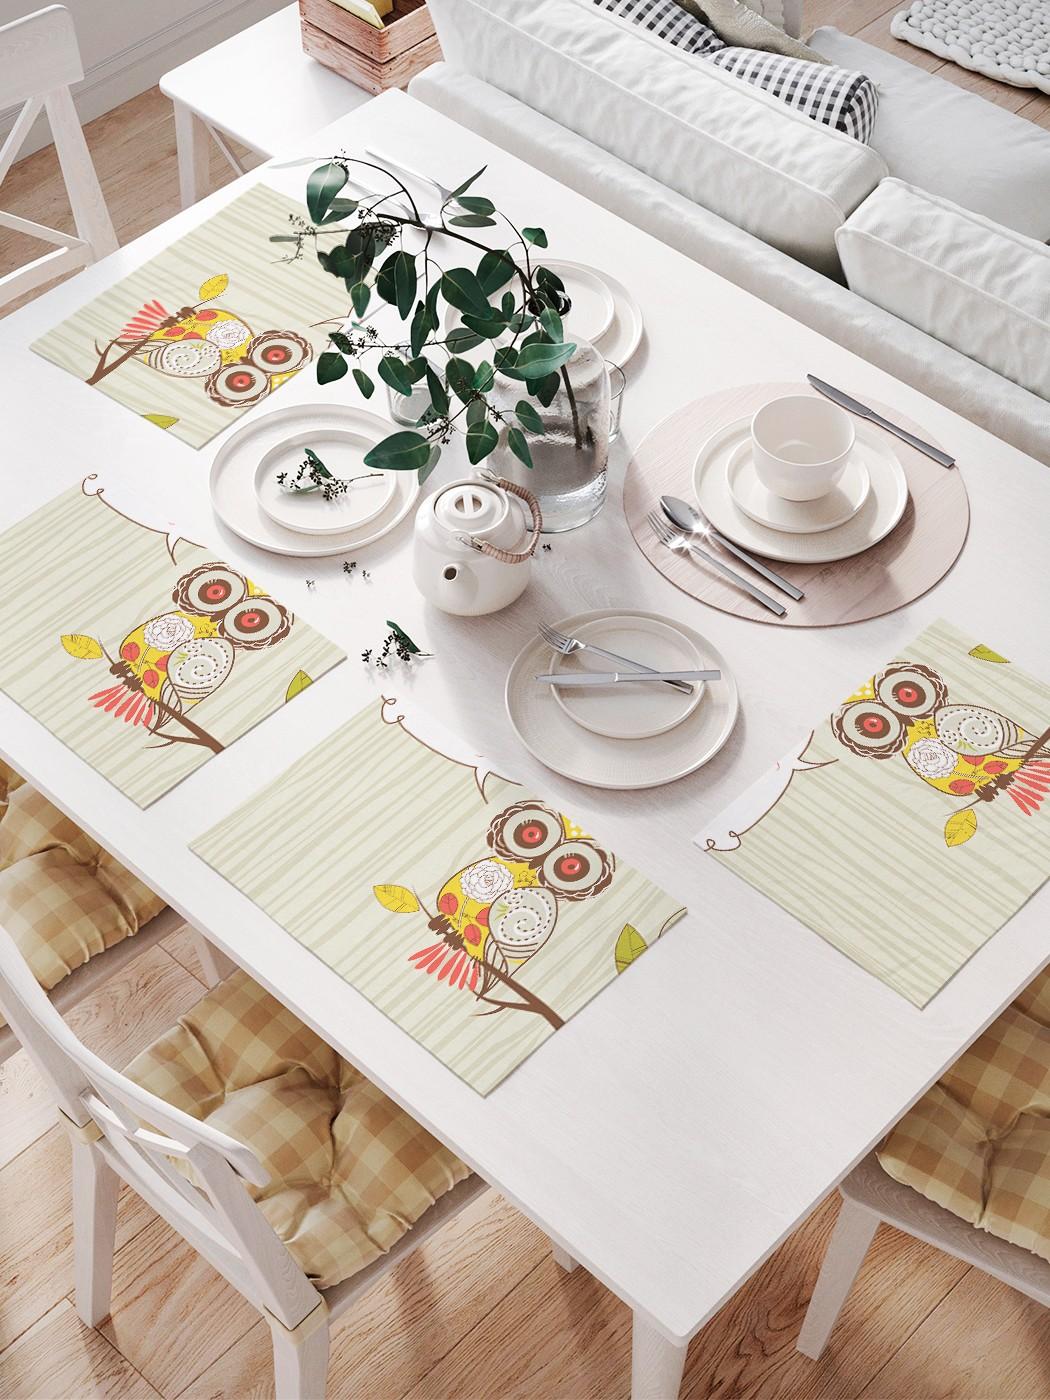 Комплект салфеток для сервировки стола «Удивленная сова» (32х46 см, 4 шт.)